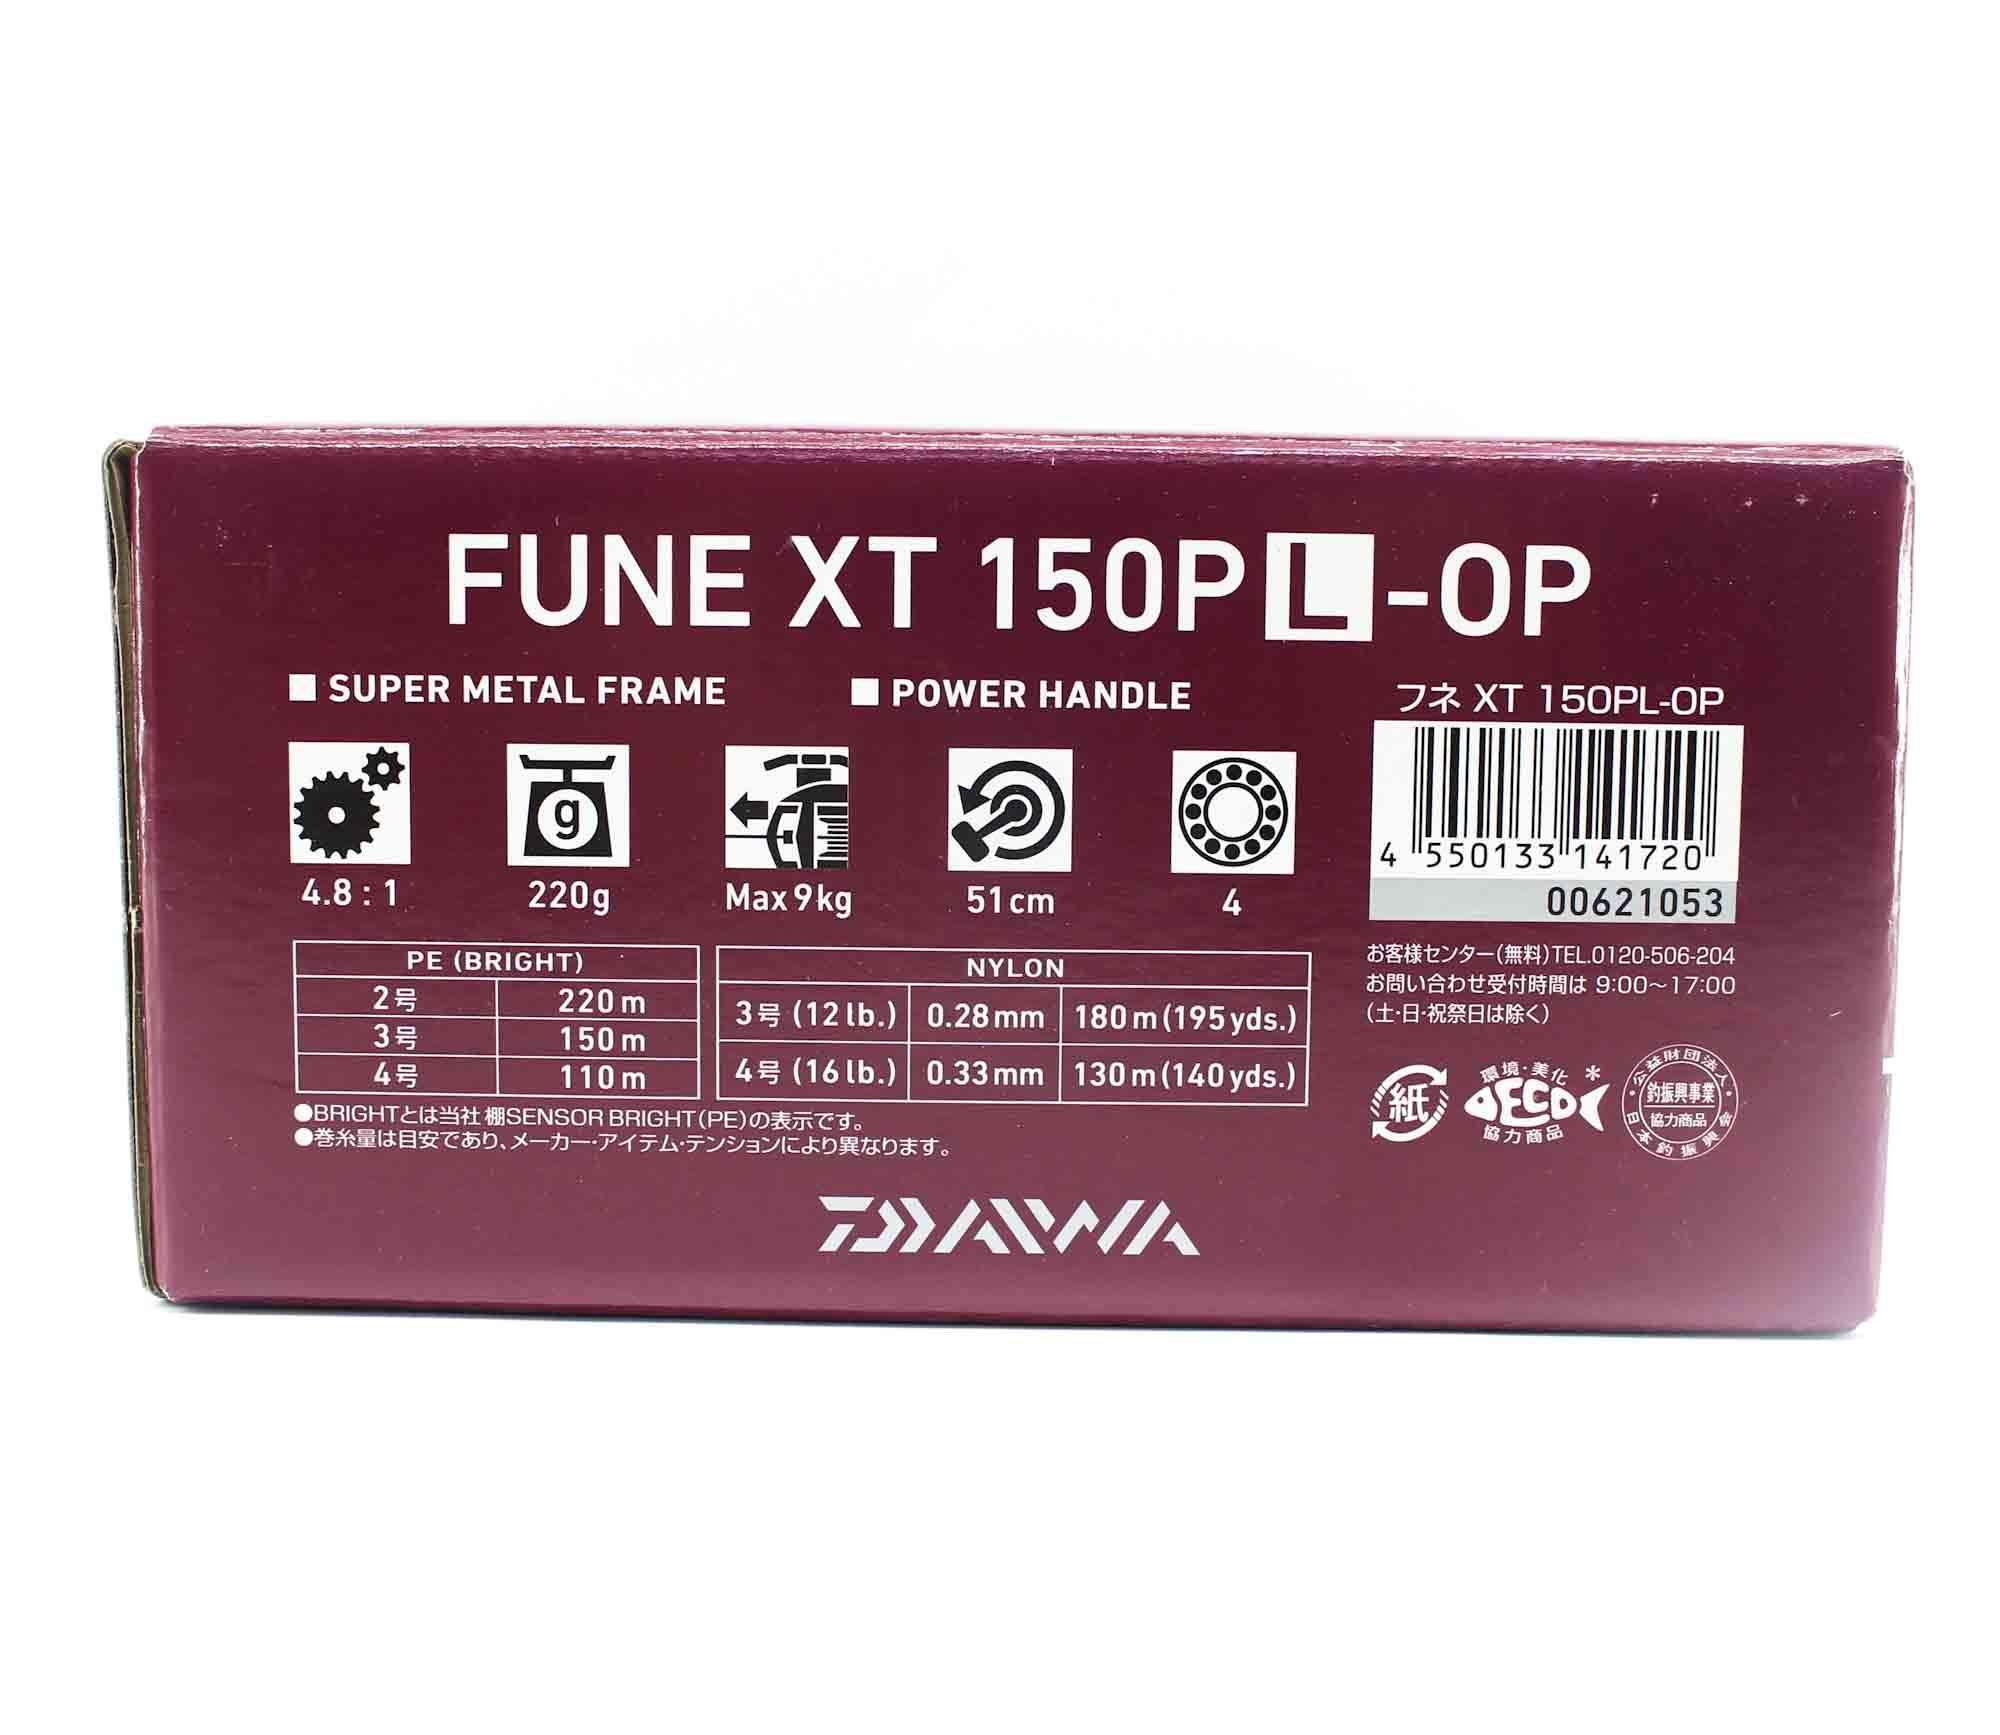 Daiwa Reel Baitcast 20 Fune XT 150PL-OP Left Hand (1720)